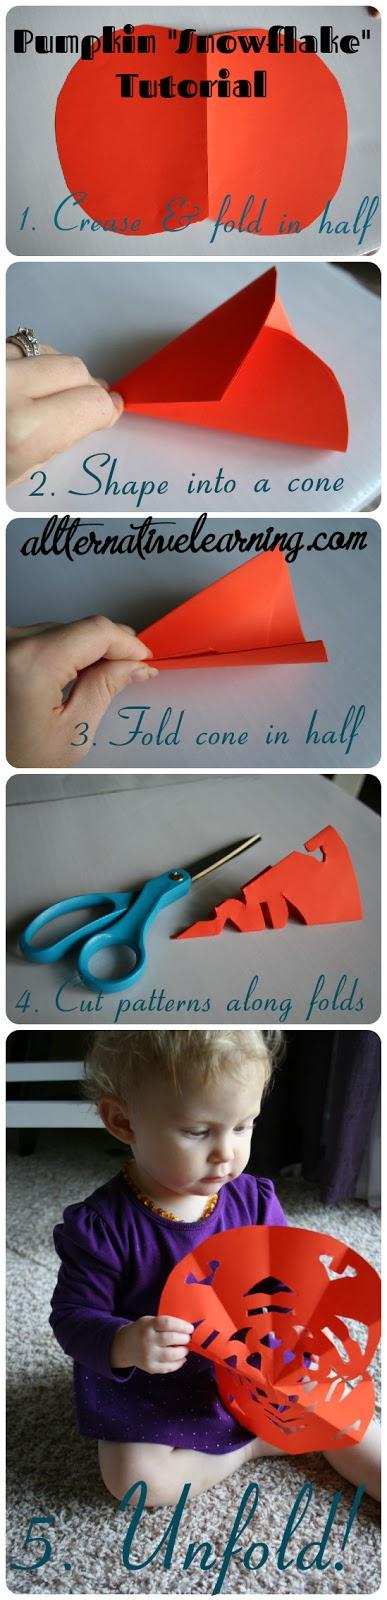 How to make paper craft pumpkins